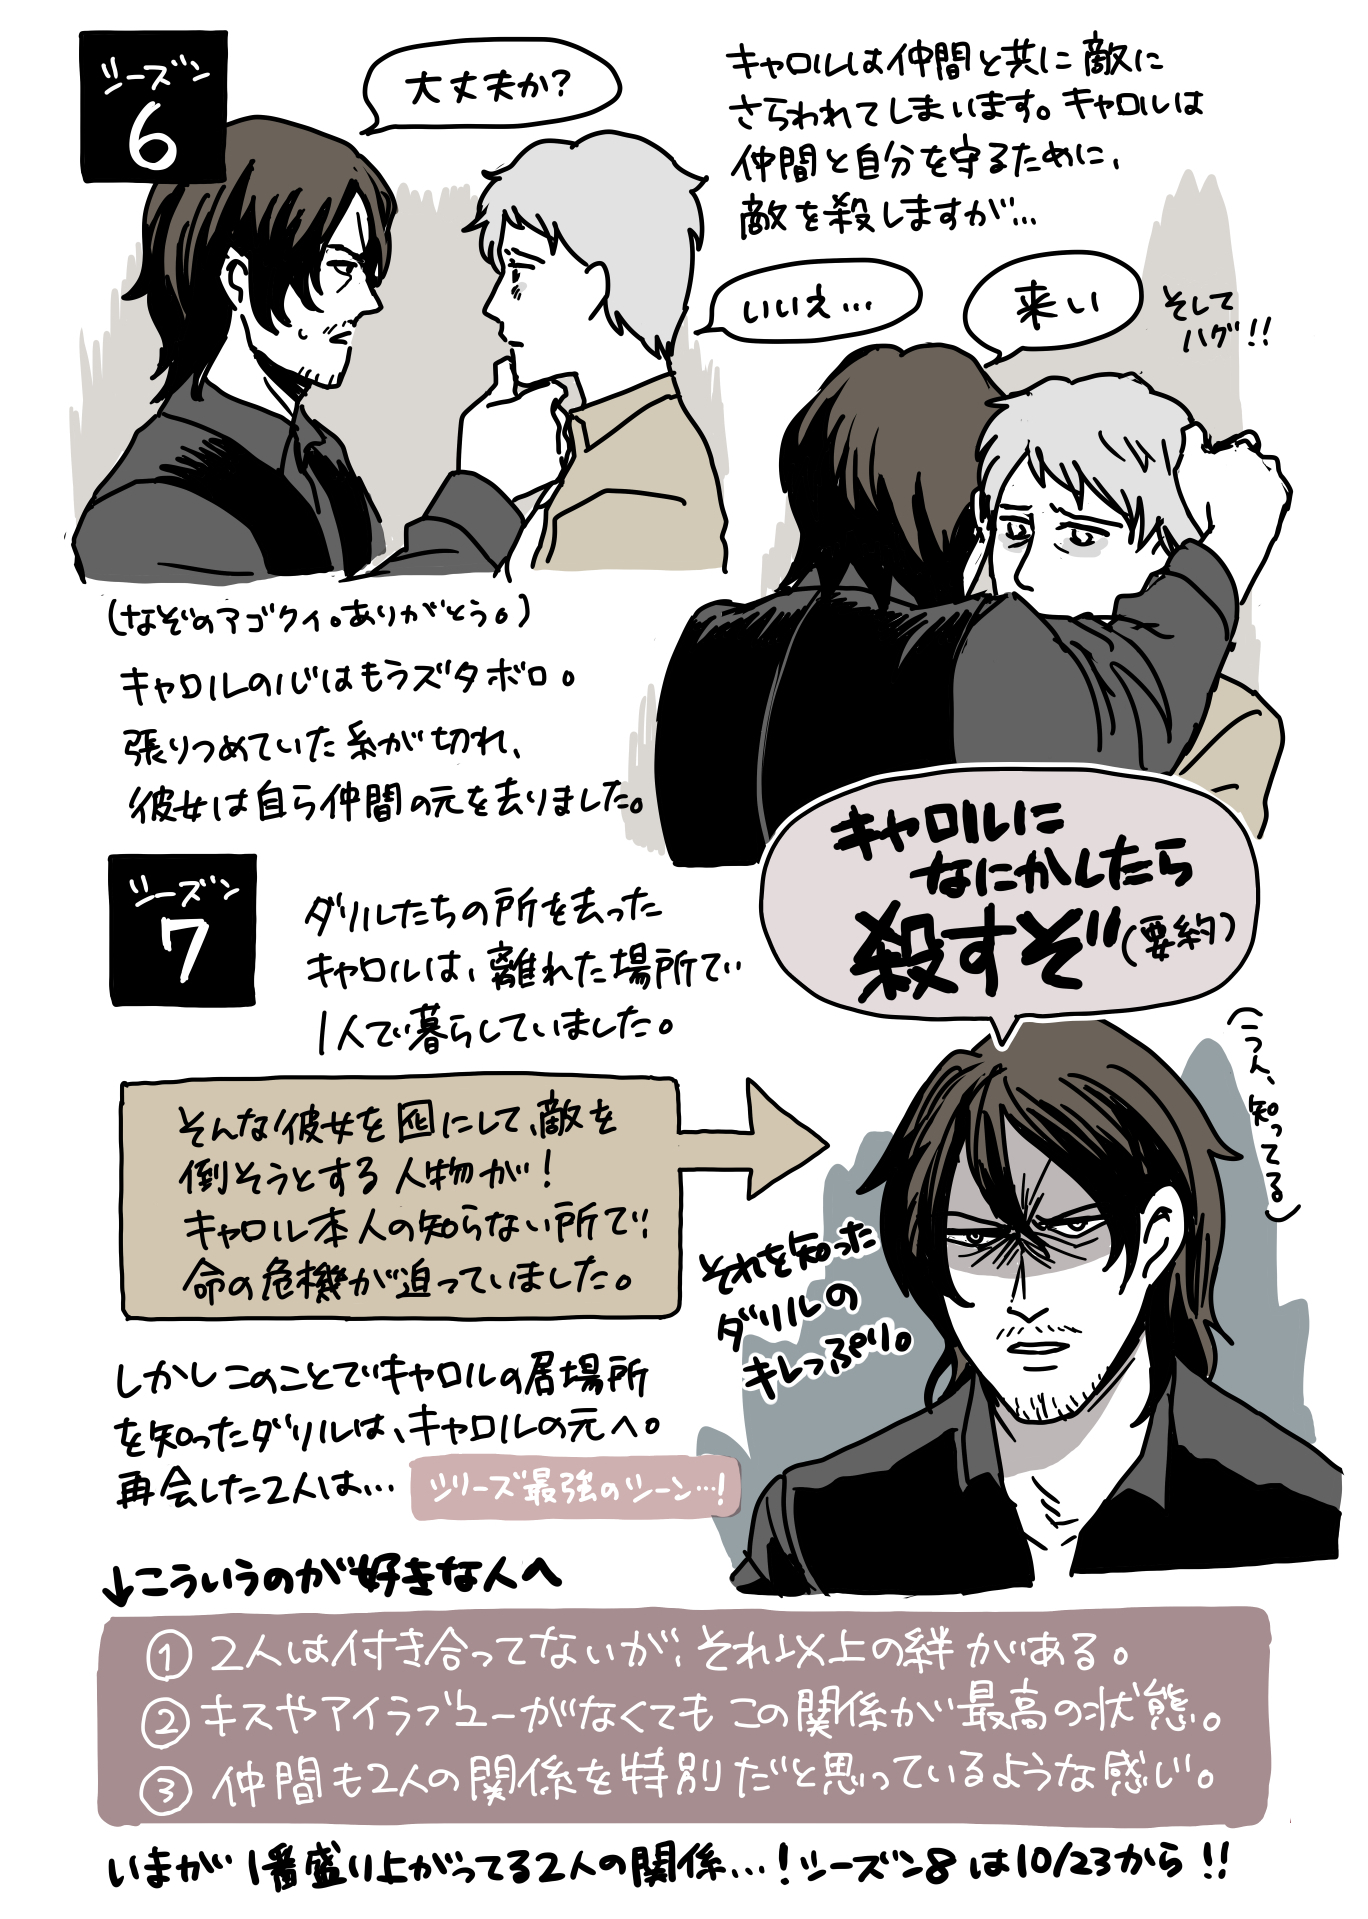 f:id:kanemotonomukuu:20171014124825j:plain